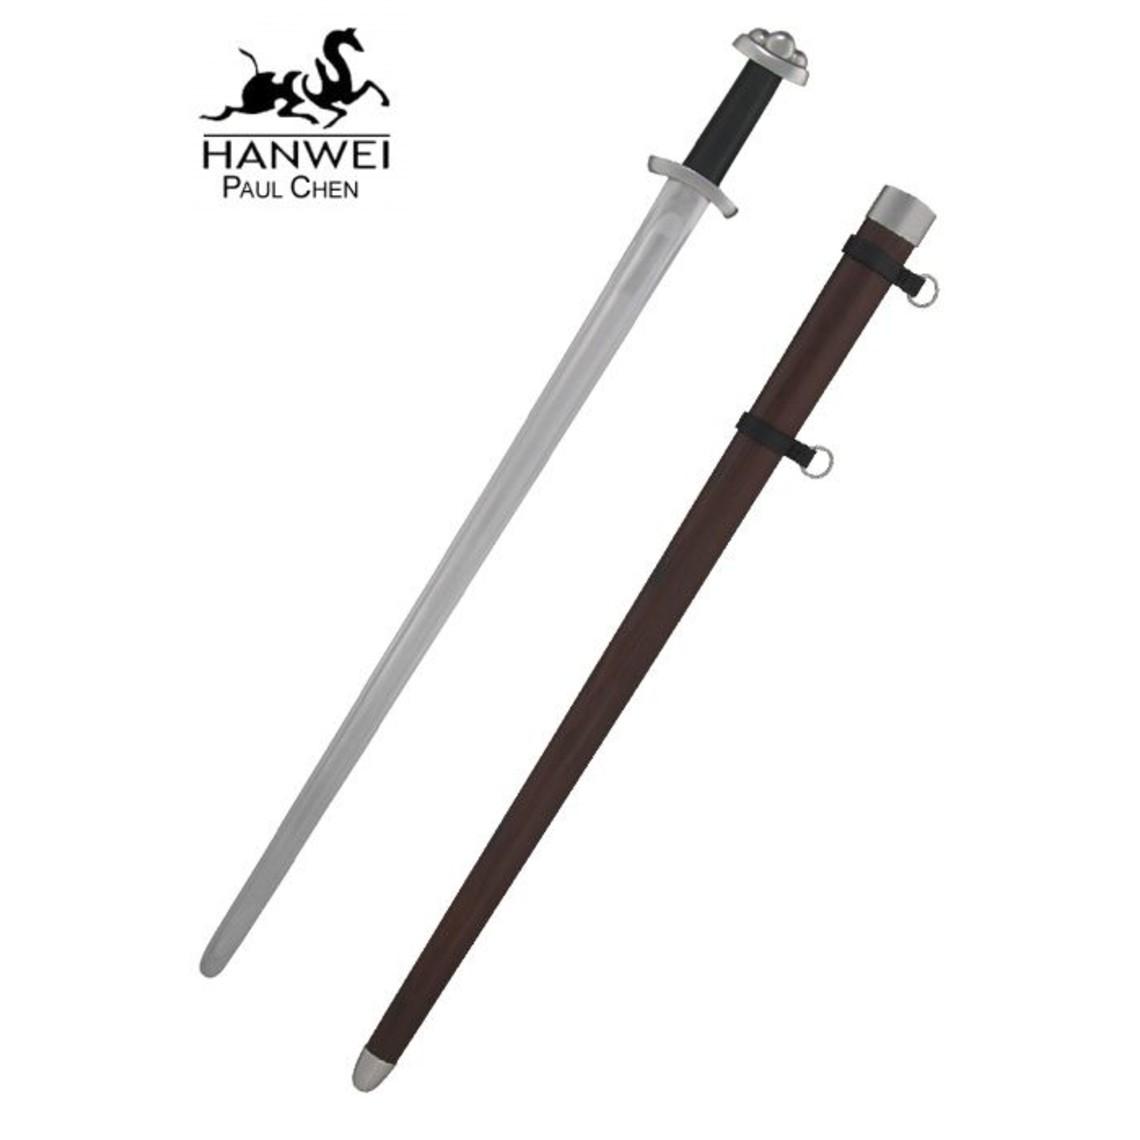 Hanwei Epée Godfred, prête au combat